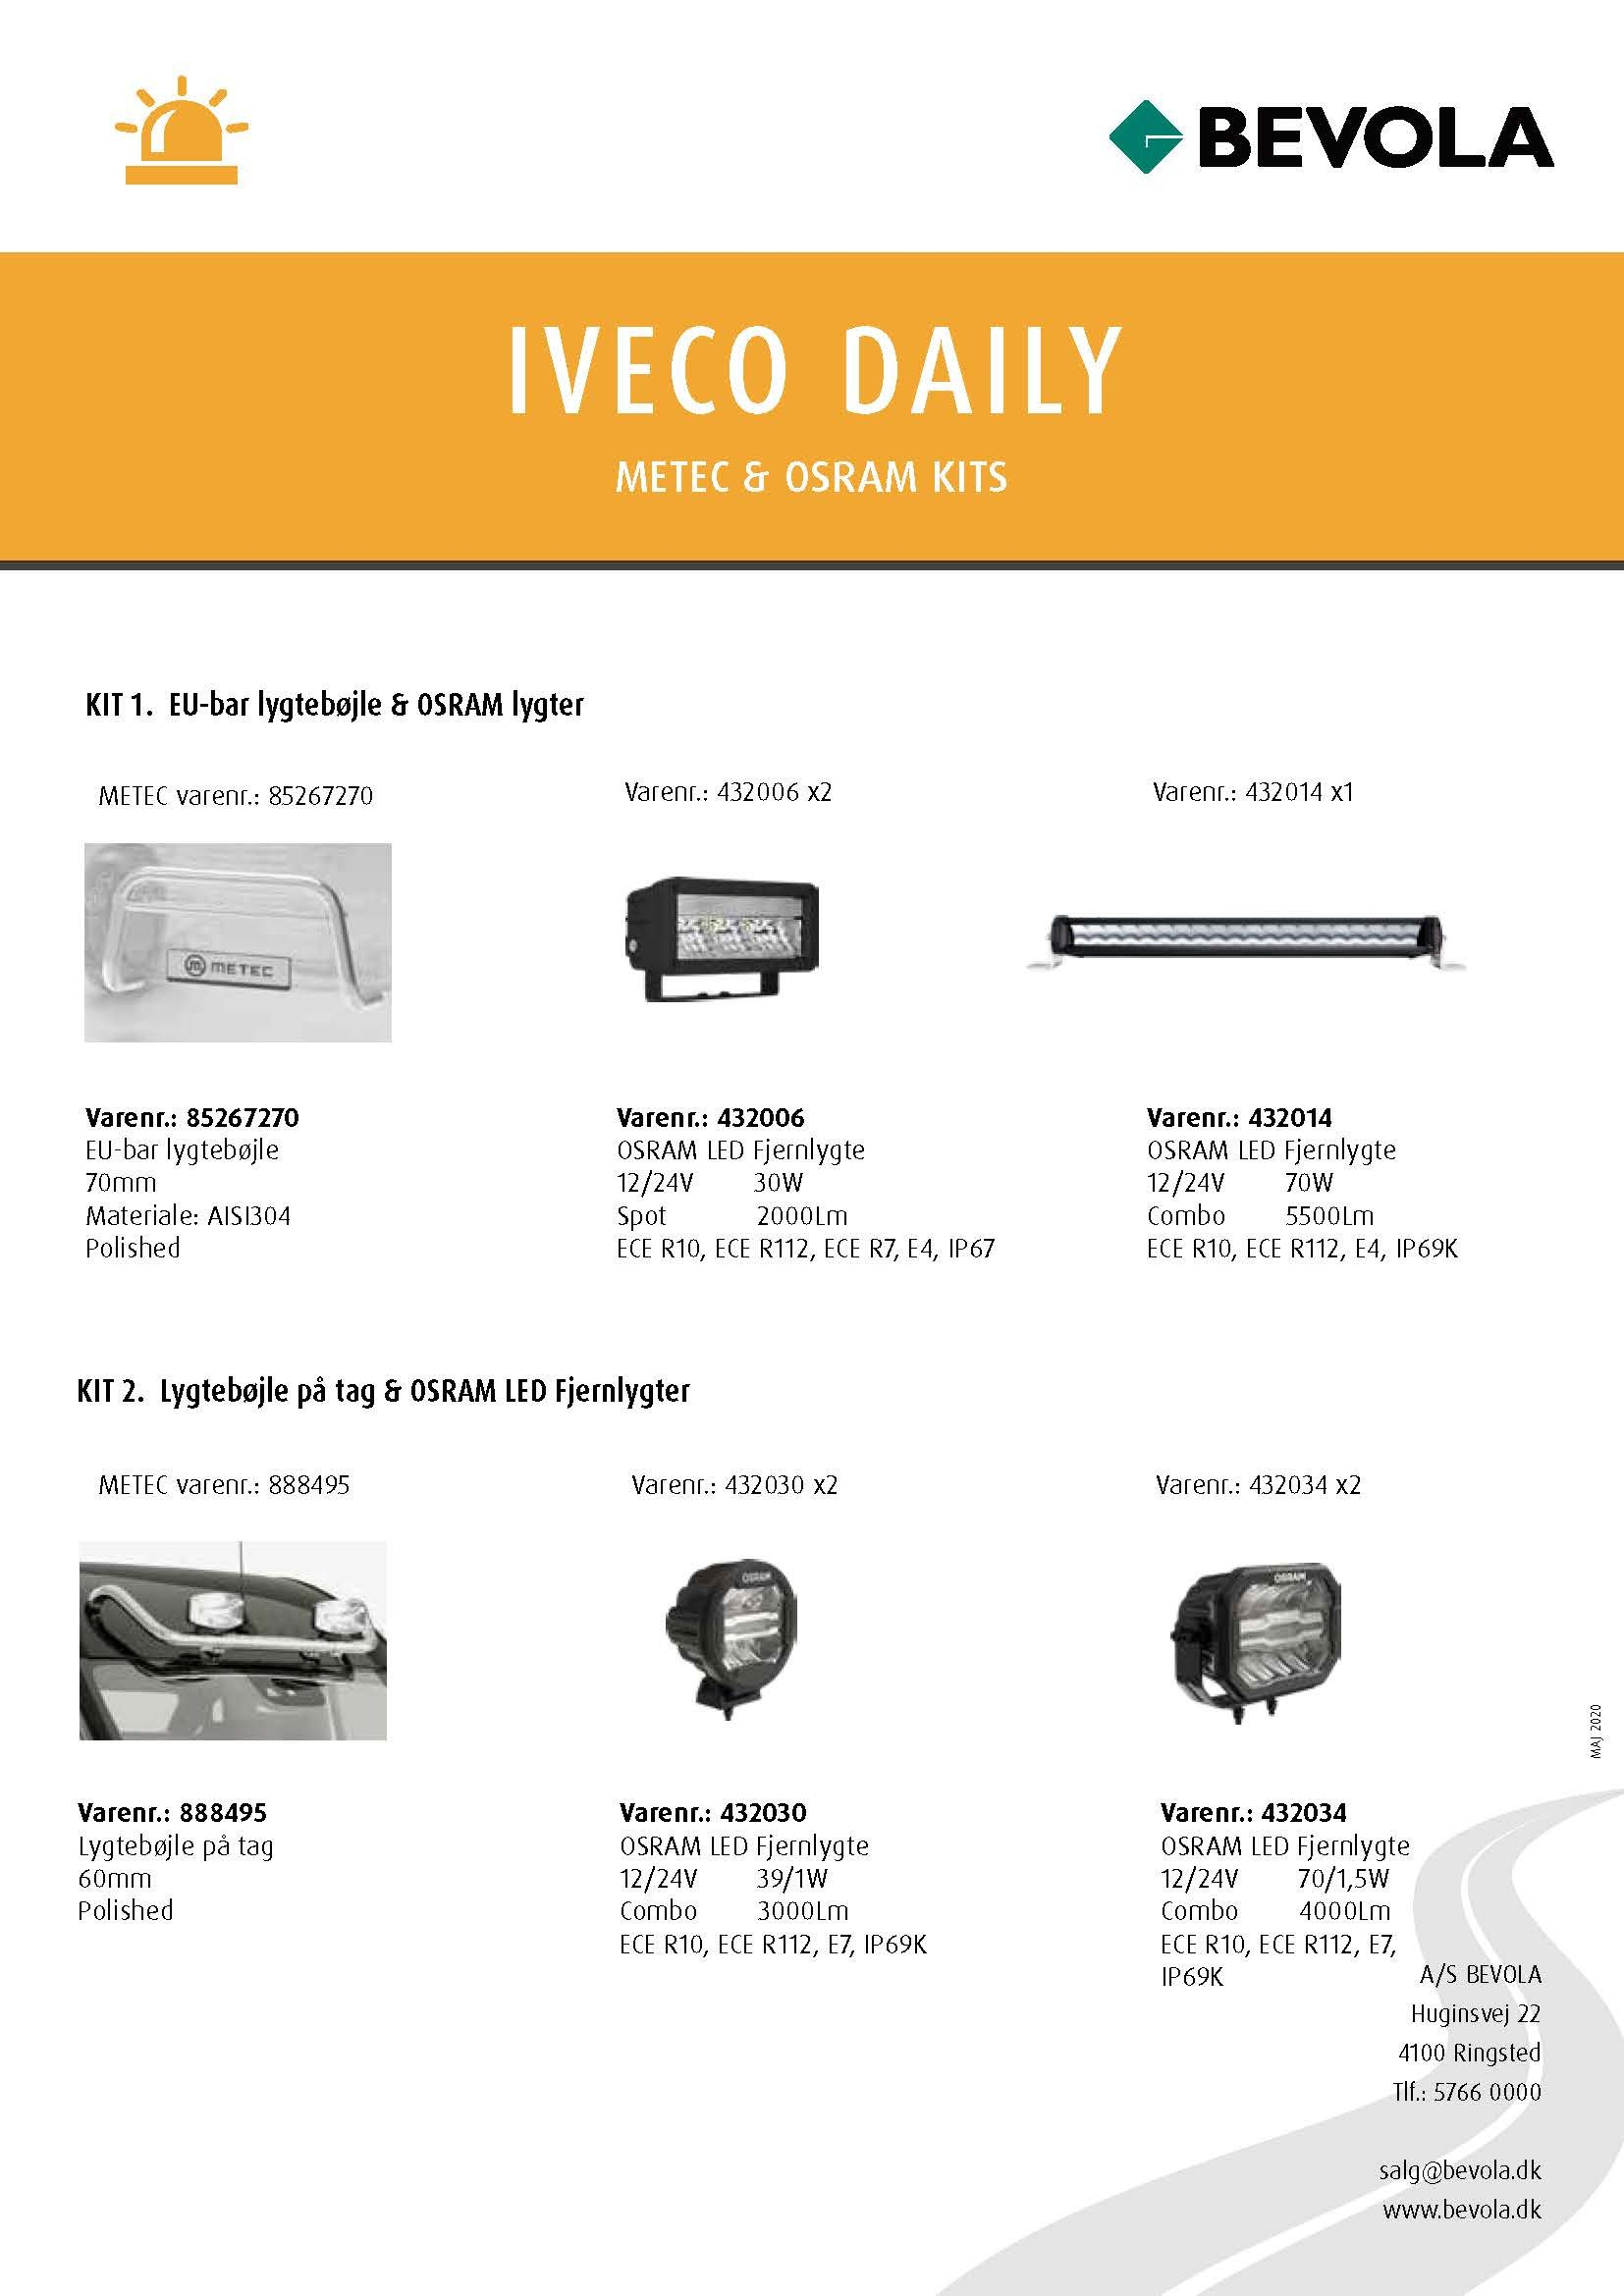 METEC + OSRAM KITS IVECO DAILY